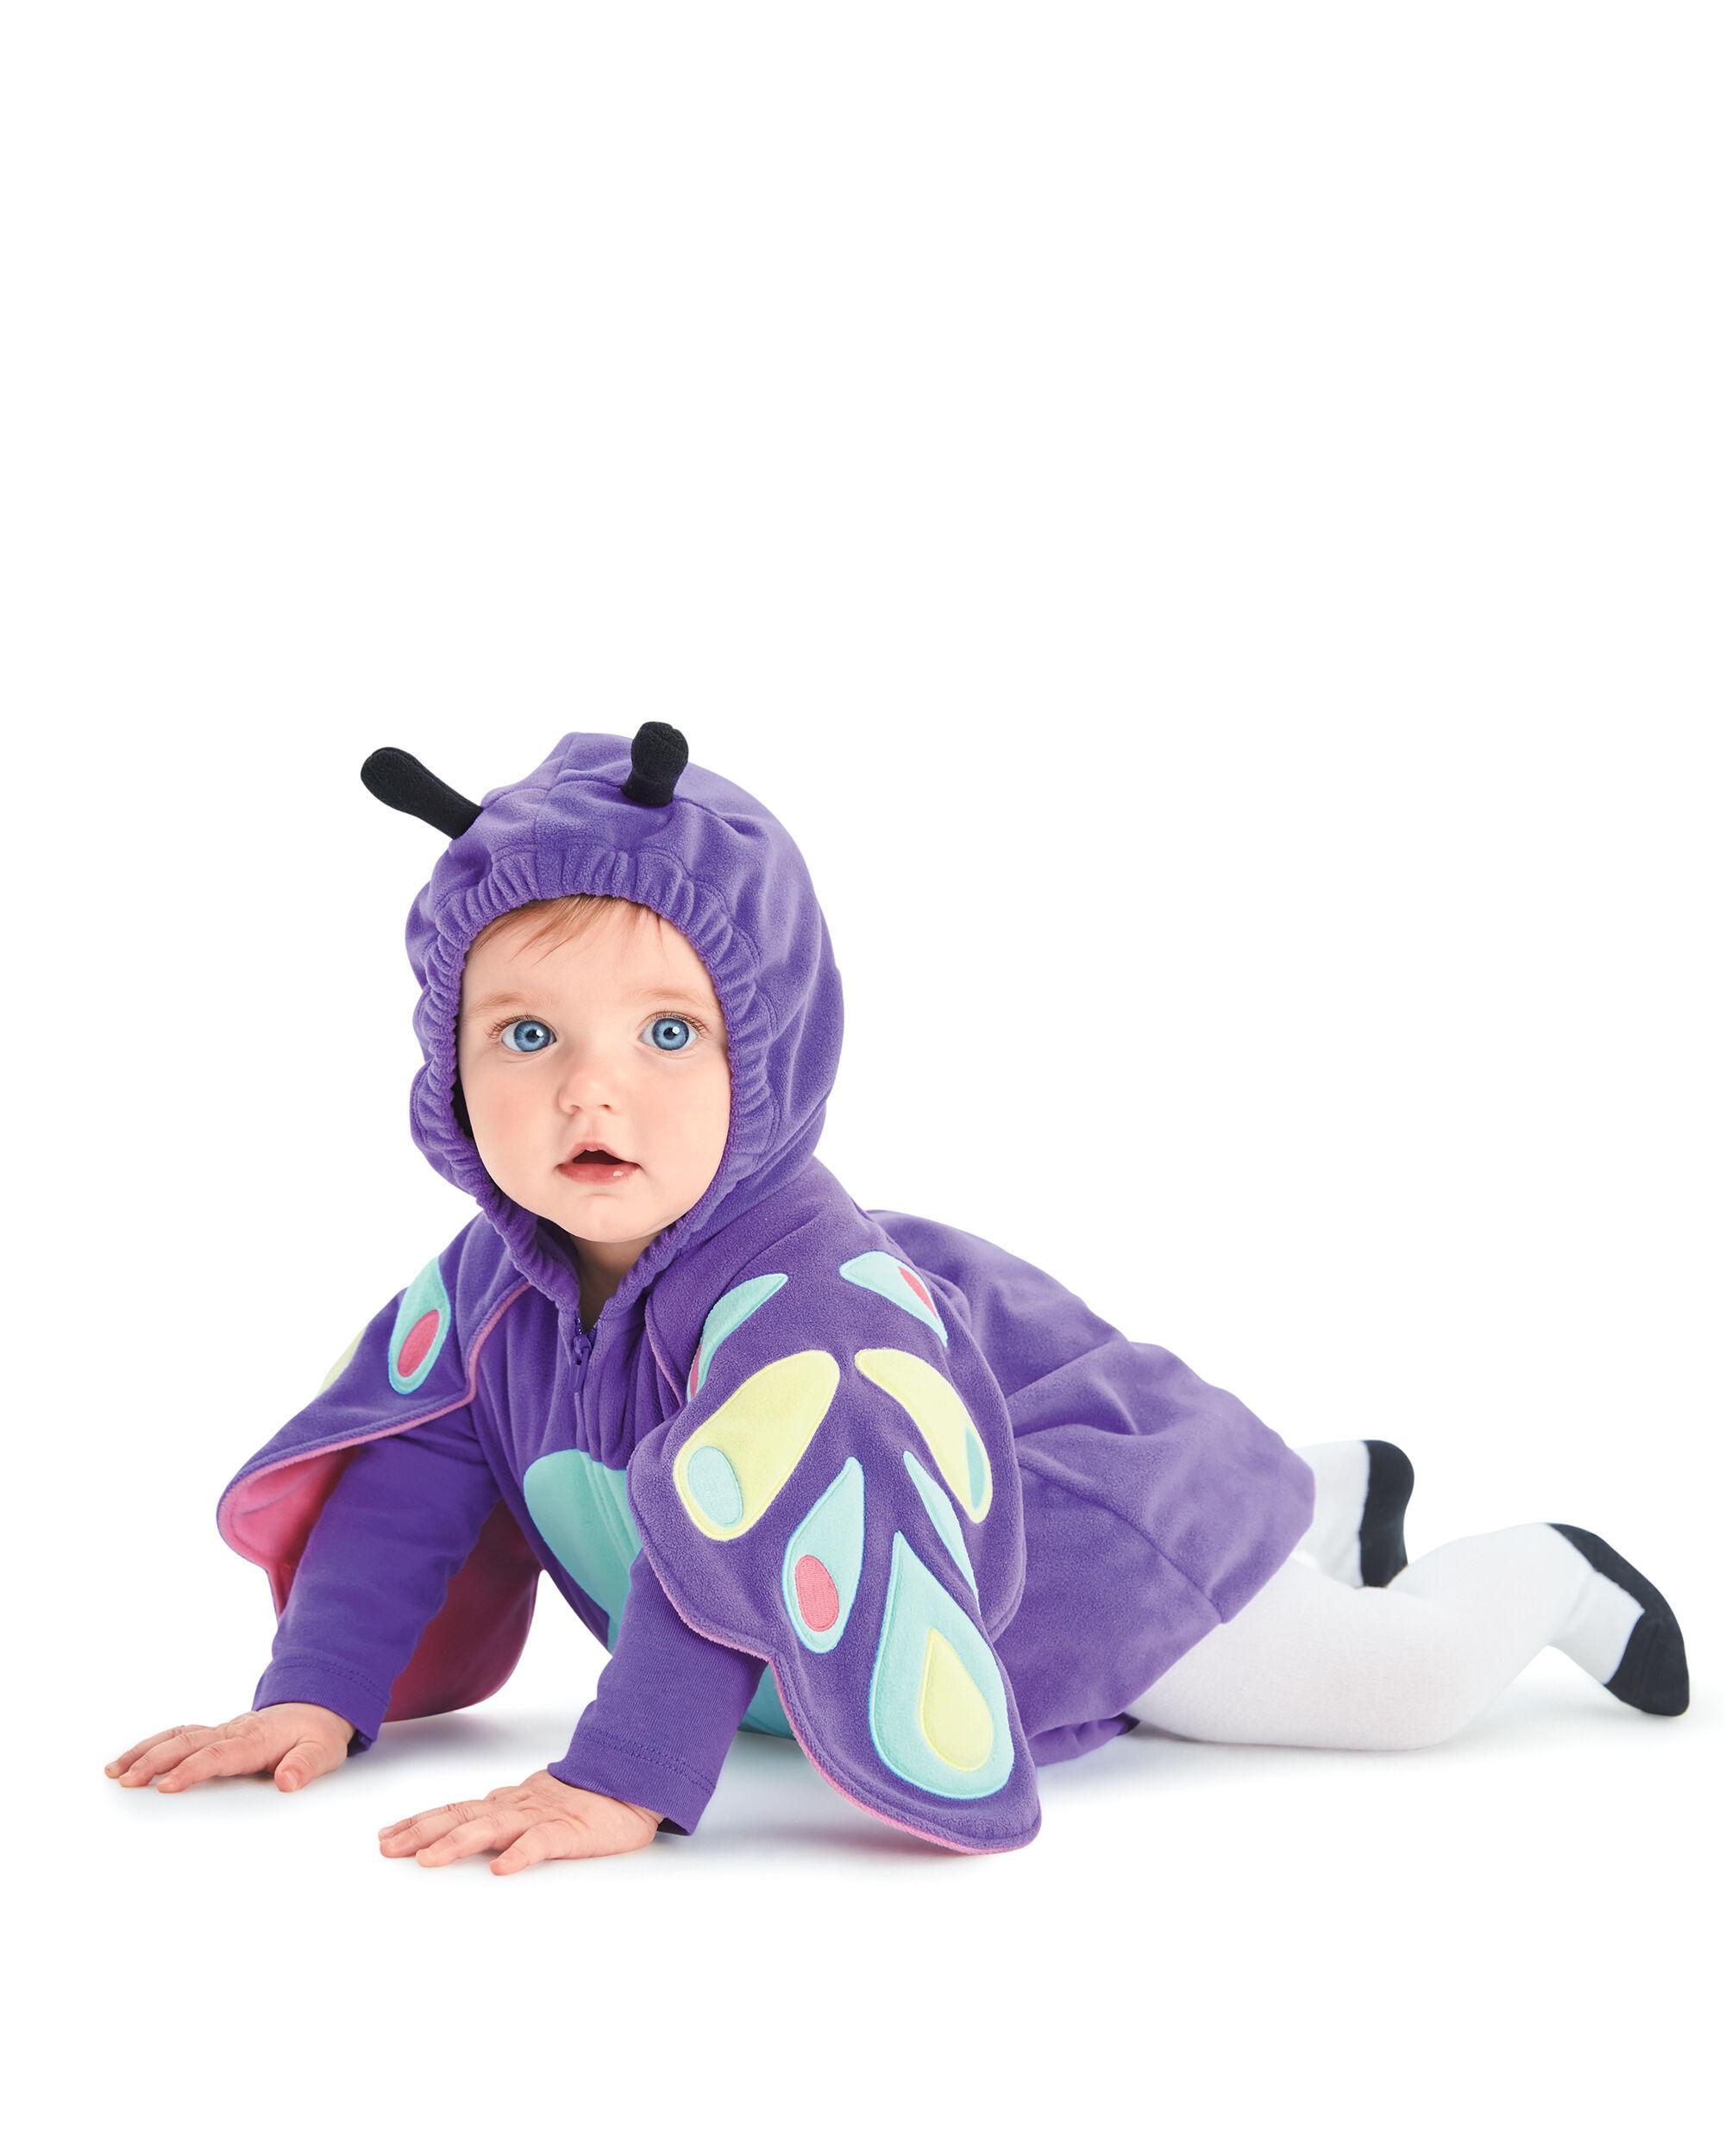 Little Butterfly Halloween Costume; Little Butterfly Halloween Costume ...  sc 1 st  Carteru0027s & Little Butterfly Halloween Costume | Carters.com